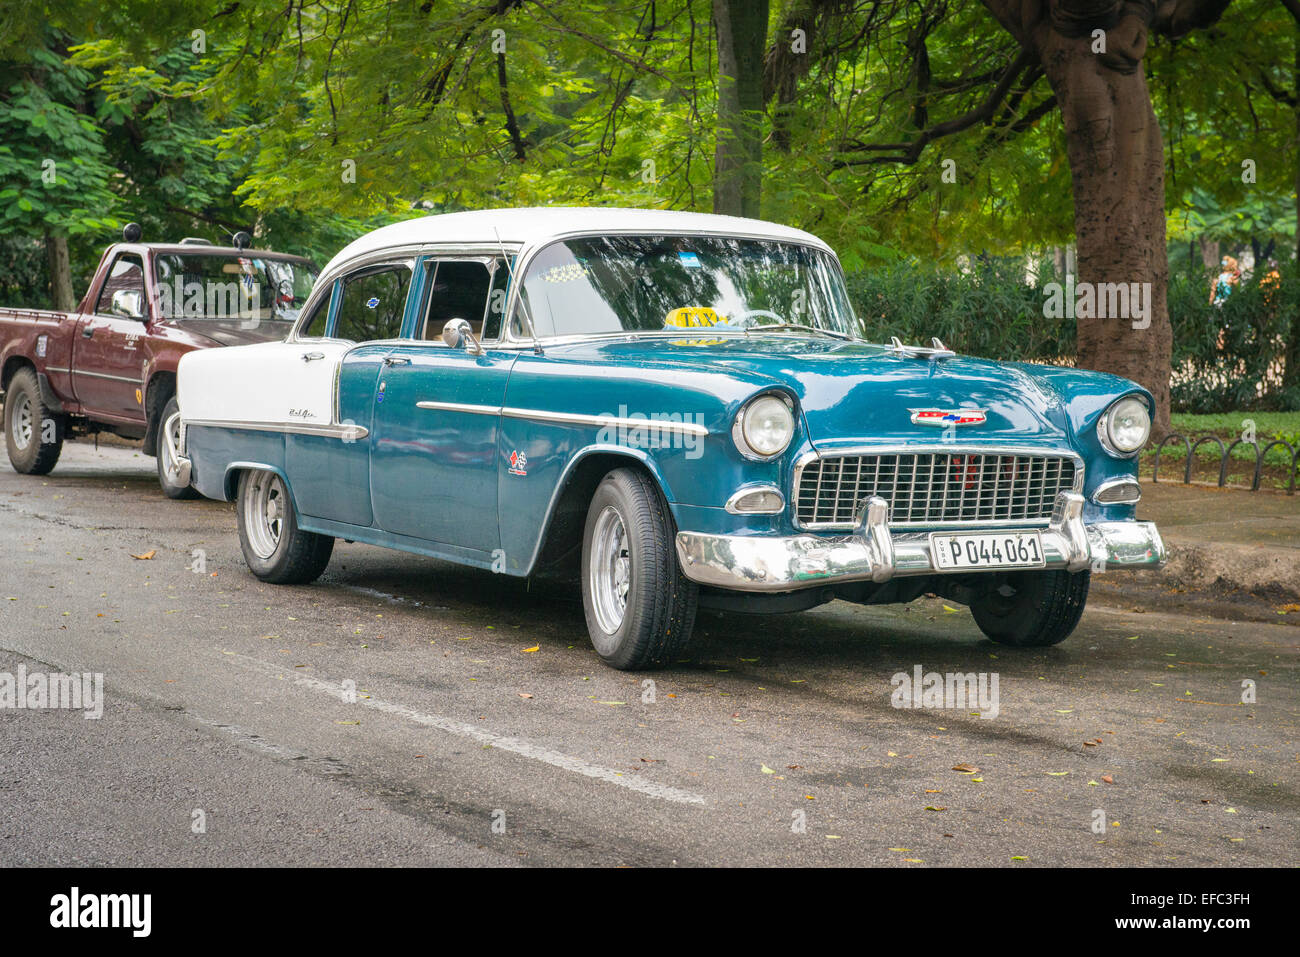 Cuba Old Havana La Habana Vieja blue white classic Chevrolet Chevy US American 1950's 50's car taxi cab - Stock Image